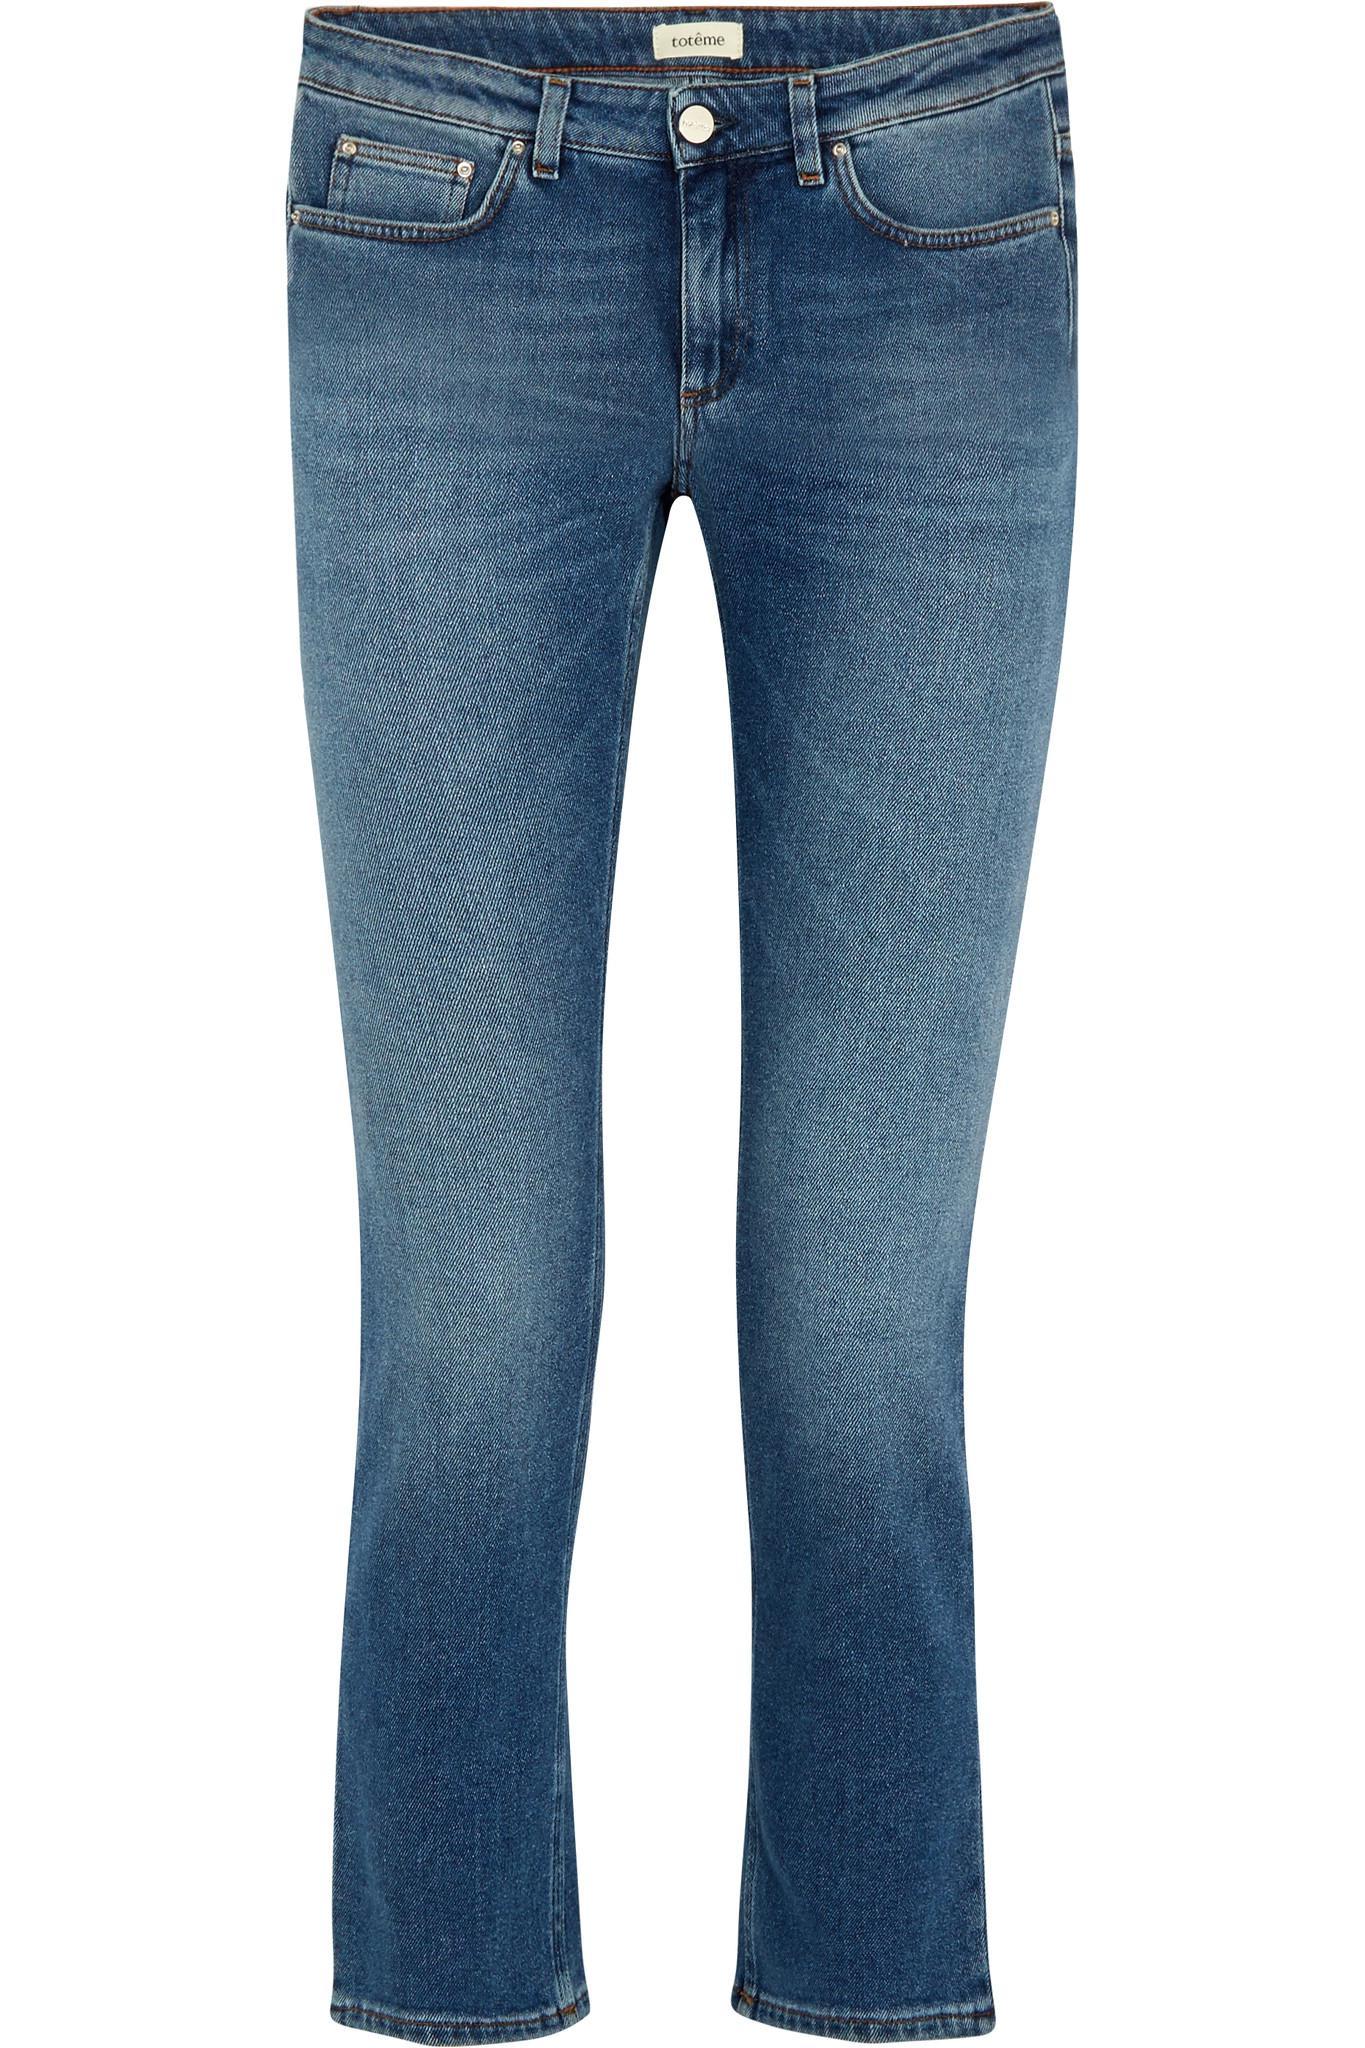 5f3ff8f78badf Lyst - Totême Cropped Mid-rise Straight-leg Jeans in Blue